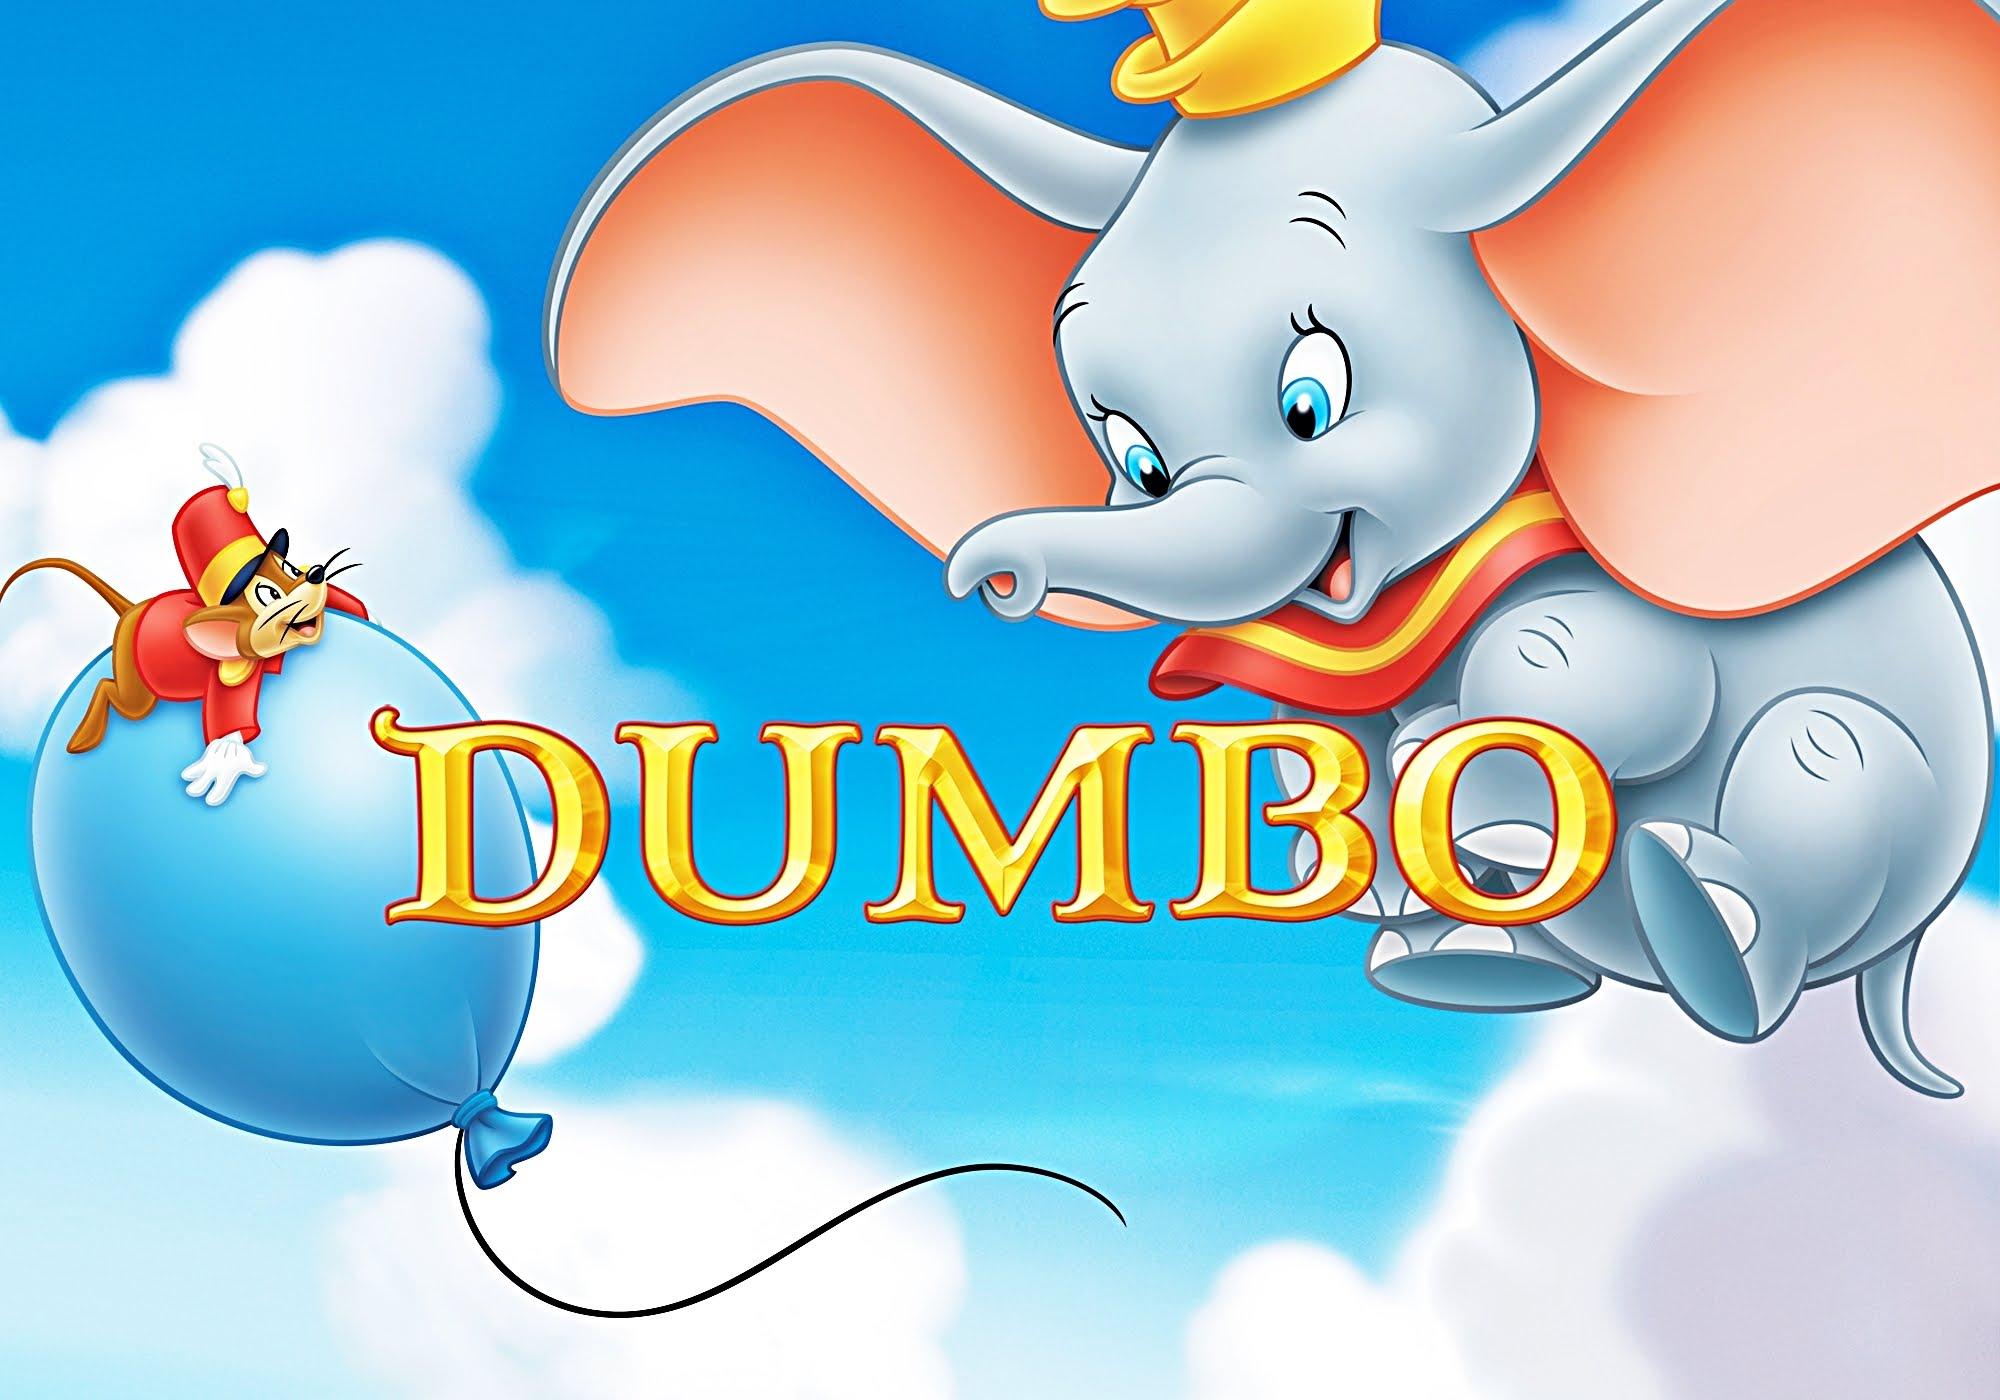 Disney Dumbo Png & Free Disney Dumbo.png Transparent Images #28444 - PNGio